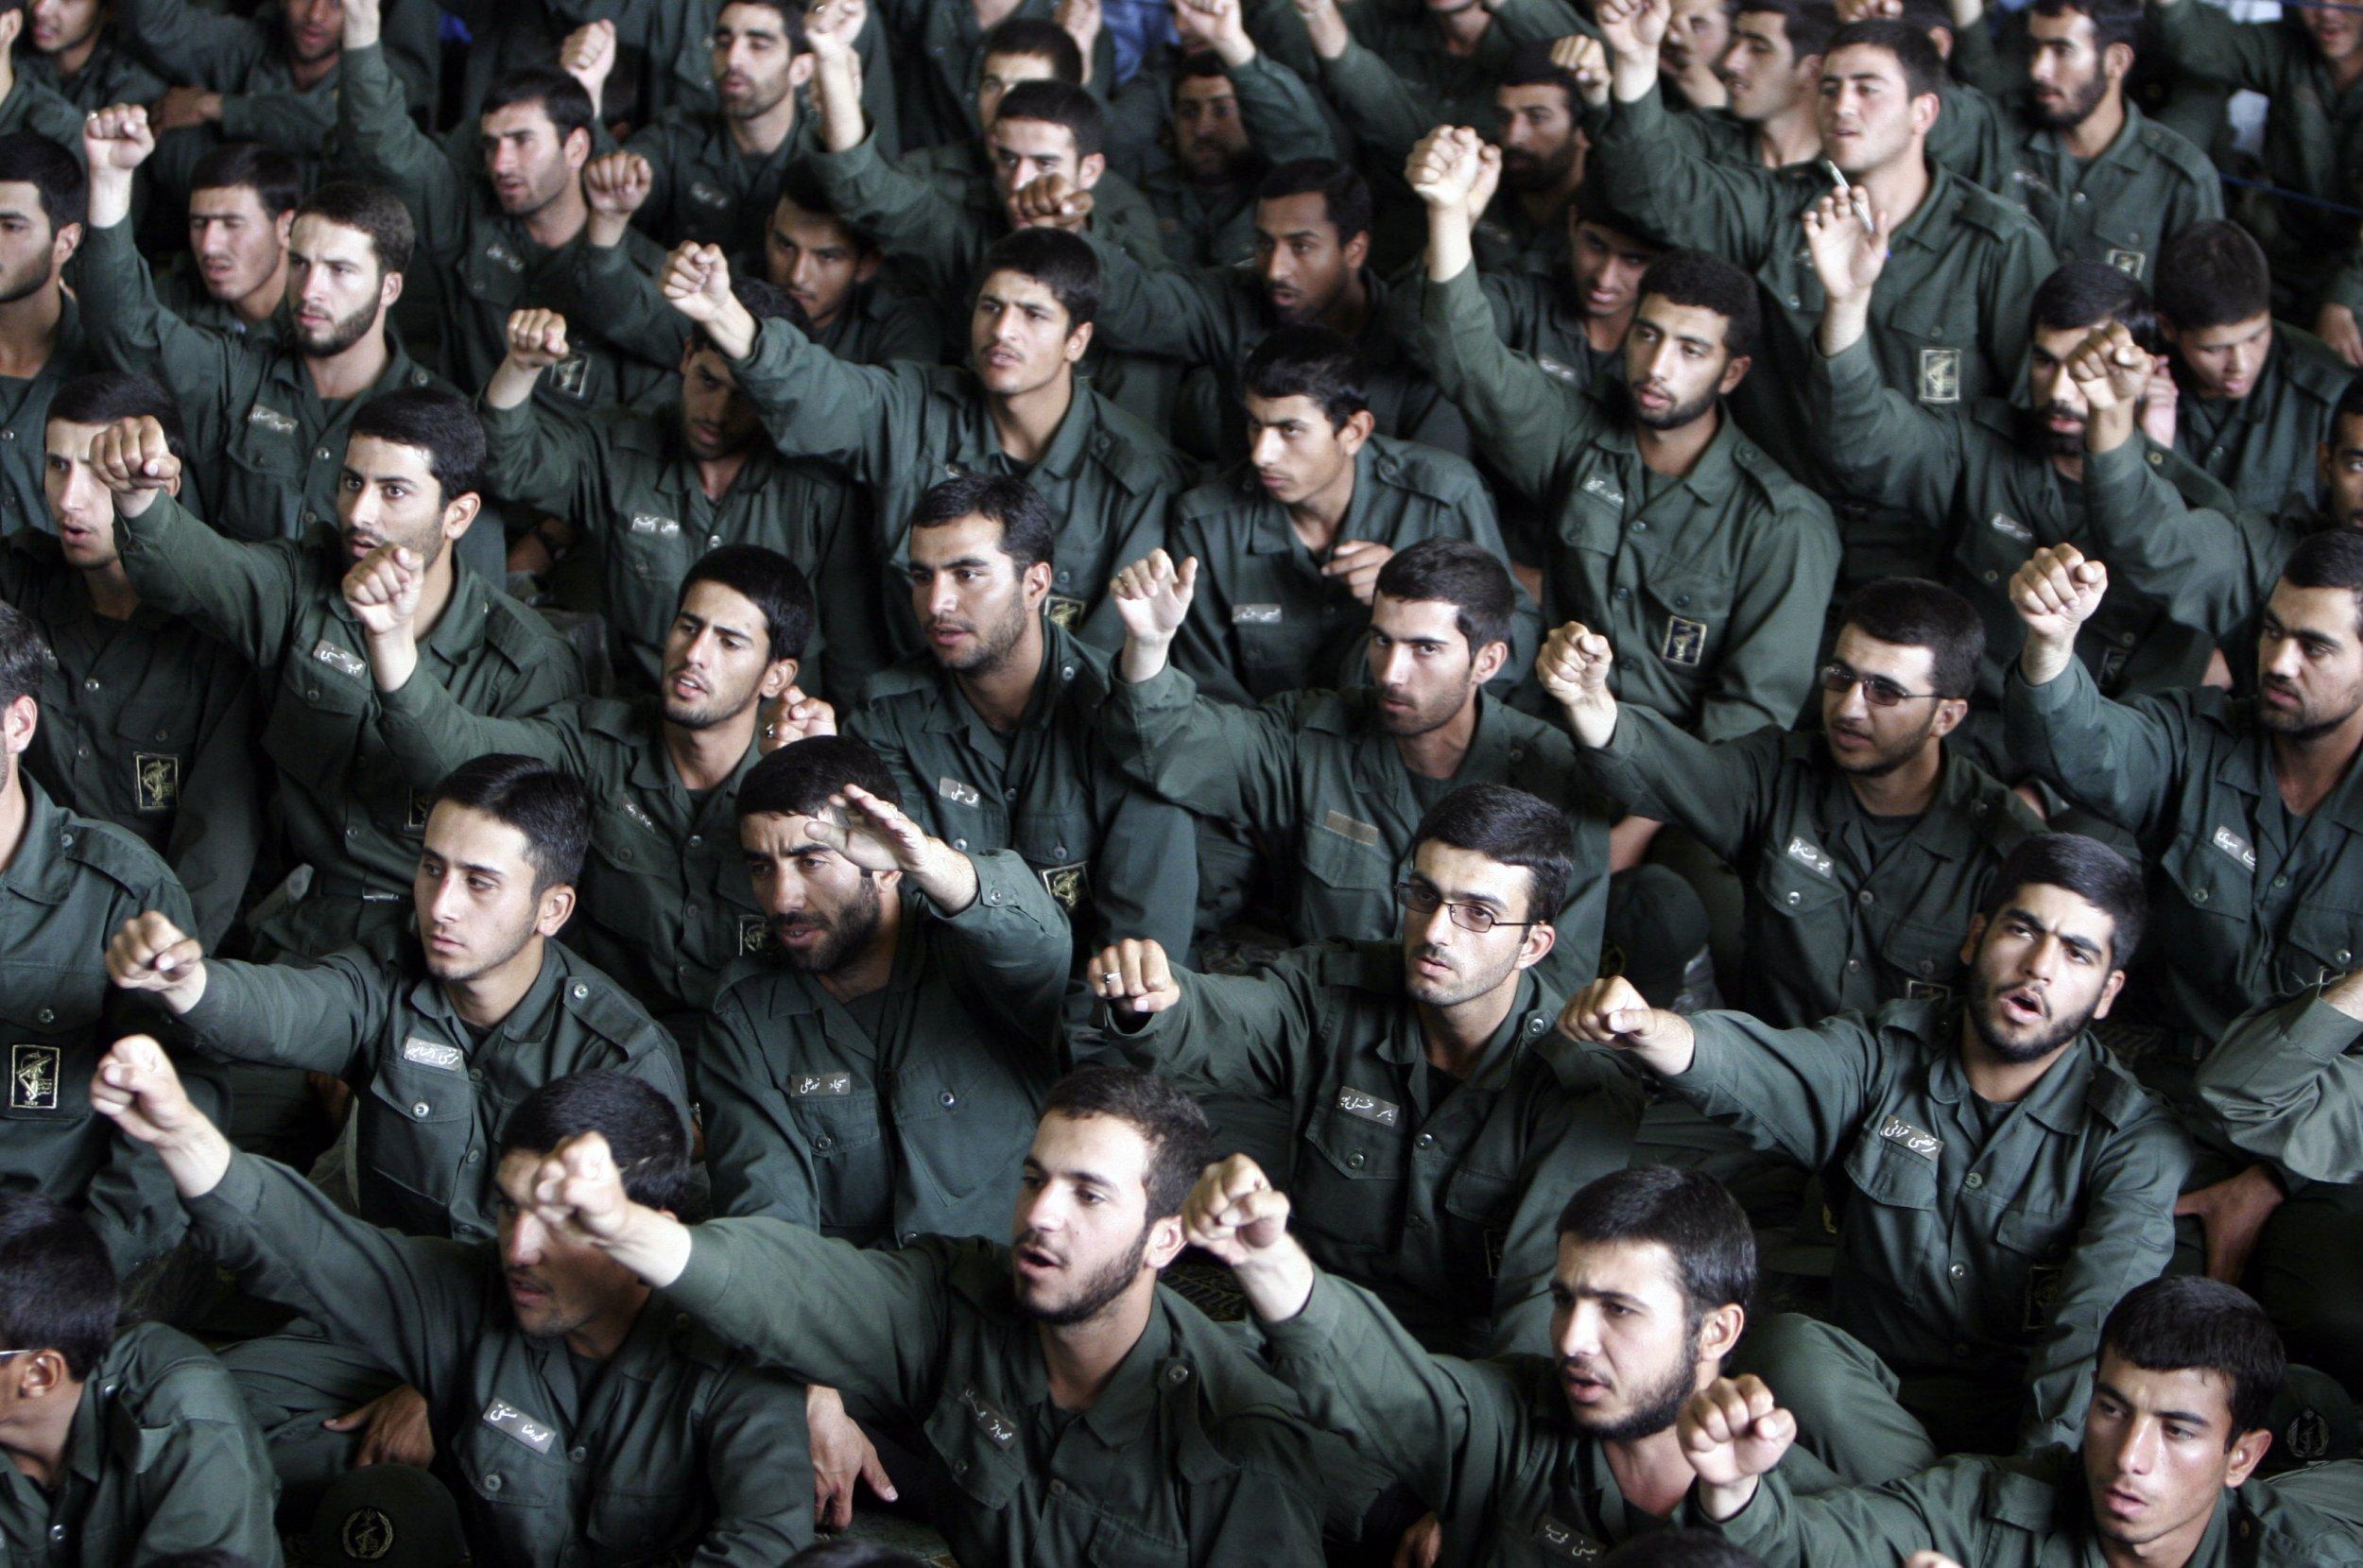 1014_Iran Revolutionary Guard